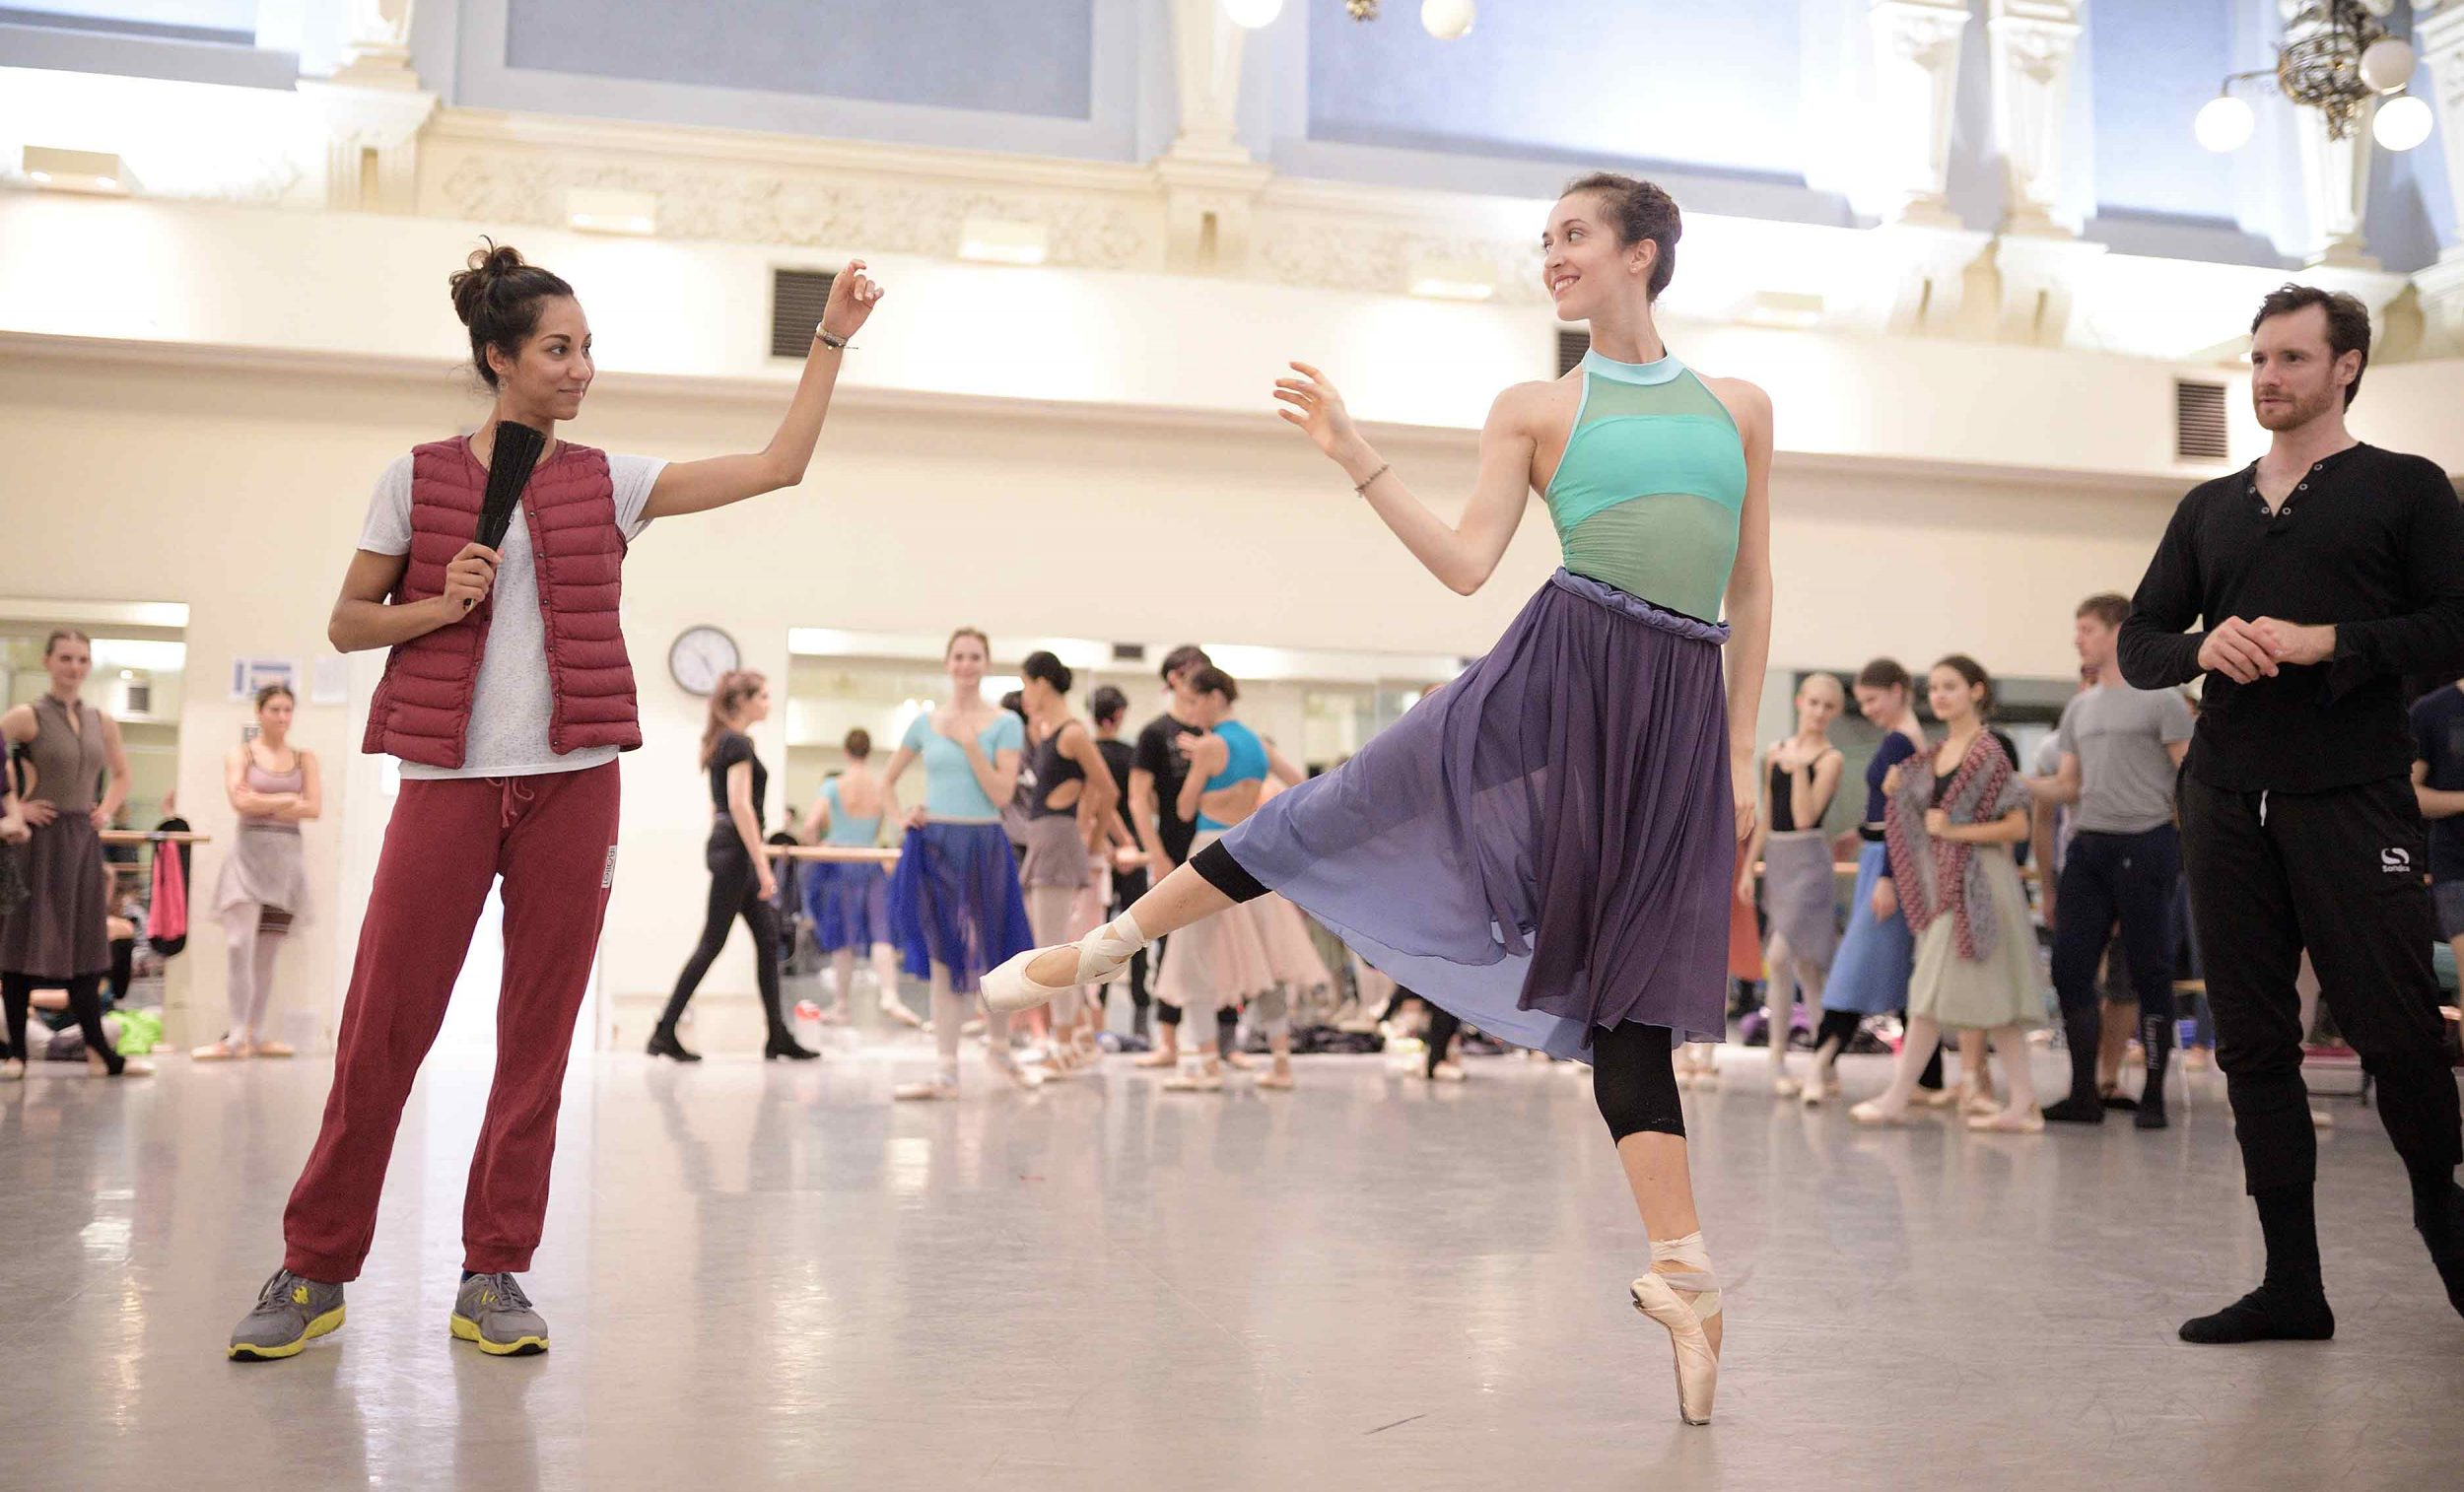 Sarah-Kundi,-Alice-Bellini-and-James-Streeter-in-rehearsals-for-Manon-(c)-Laurent-Liotardo_WEB